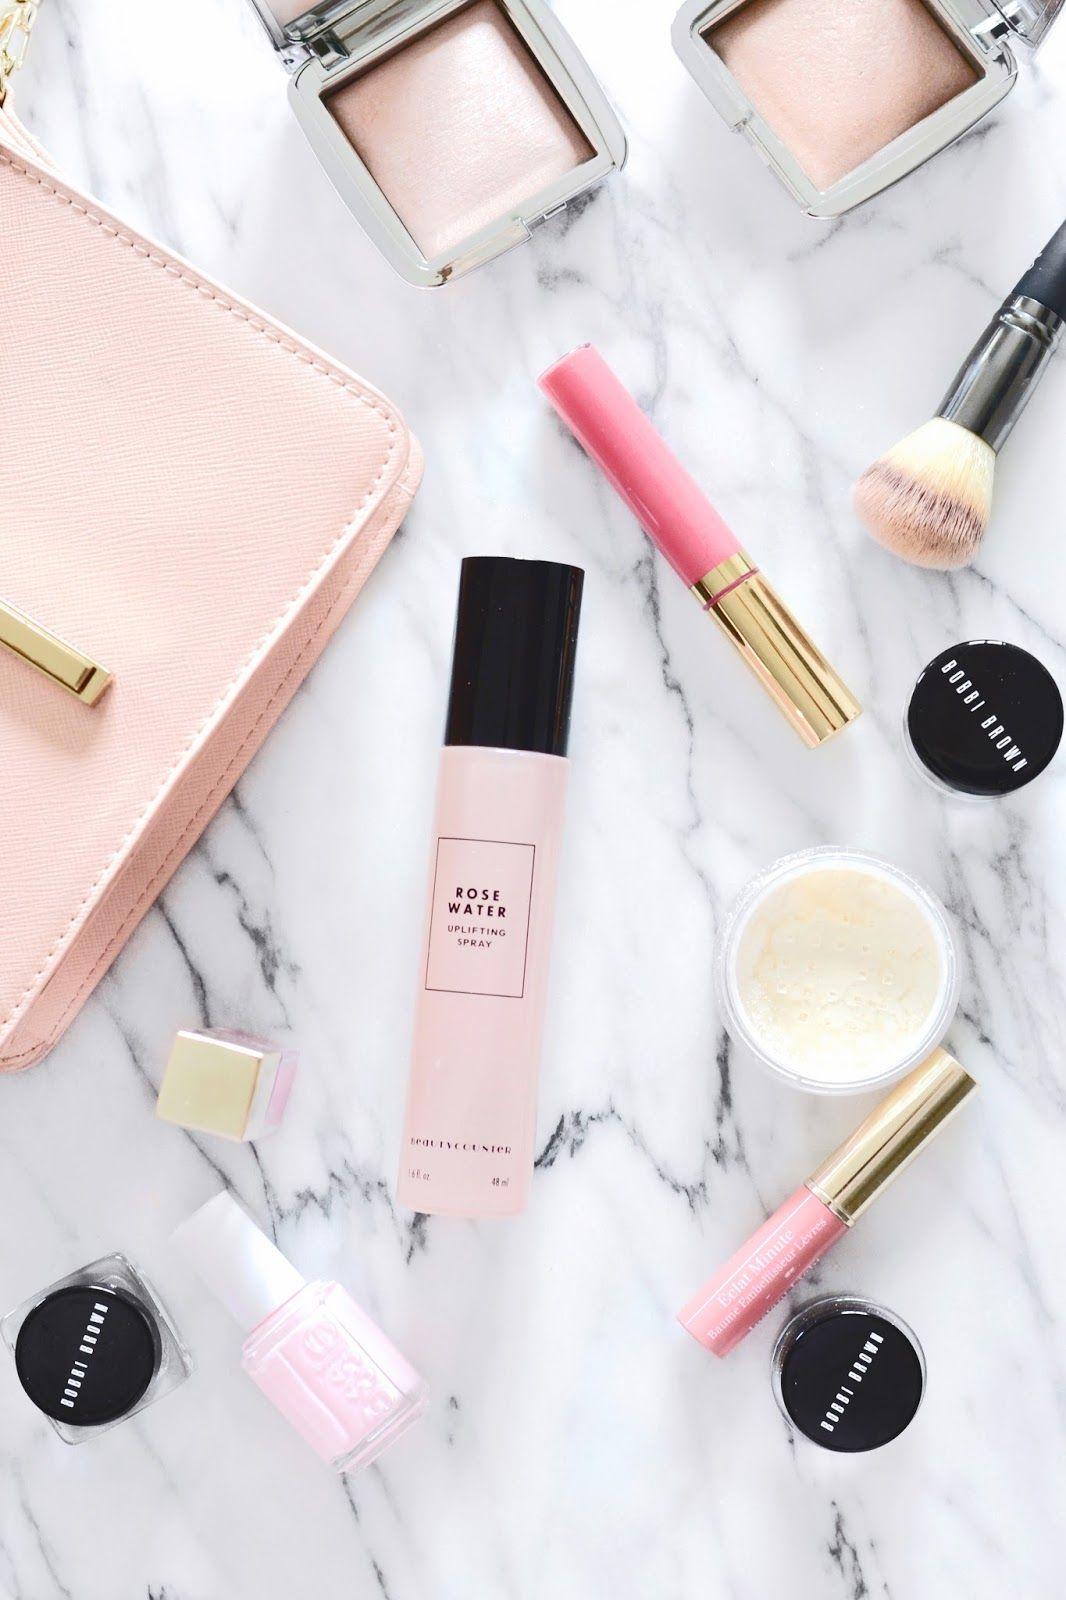 beautycounter rose water spray and beautycounter lip gloss